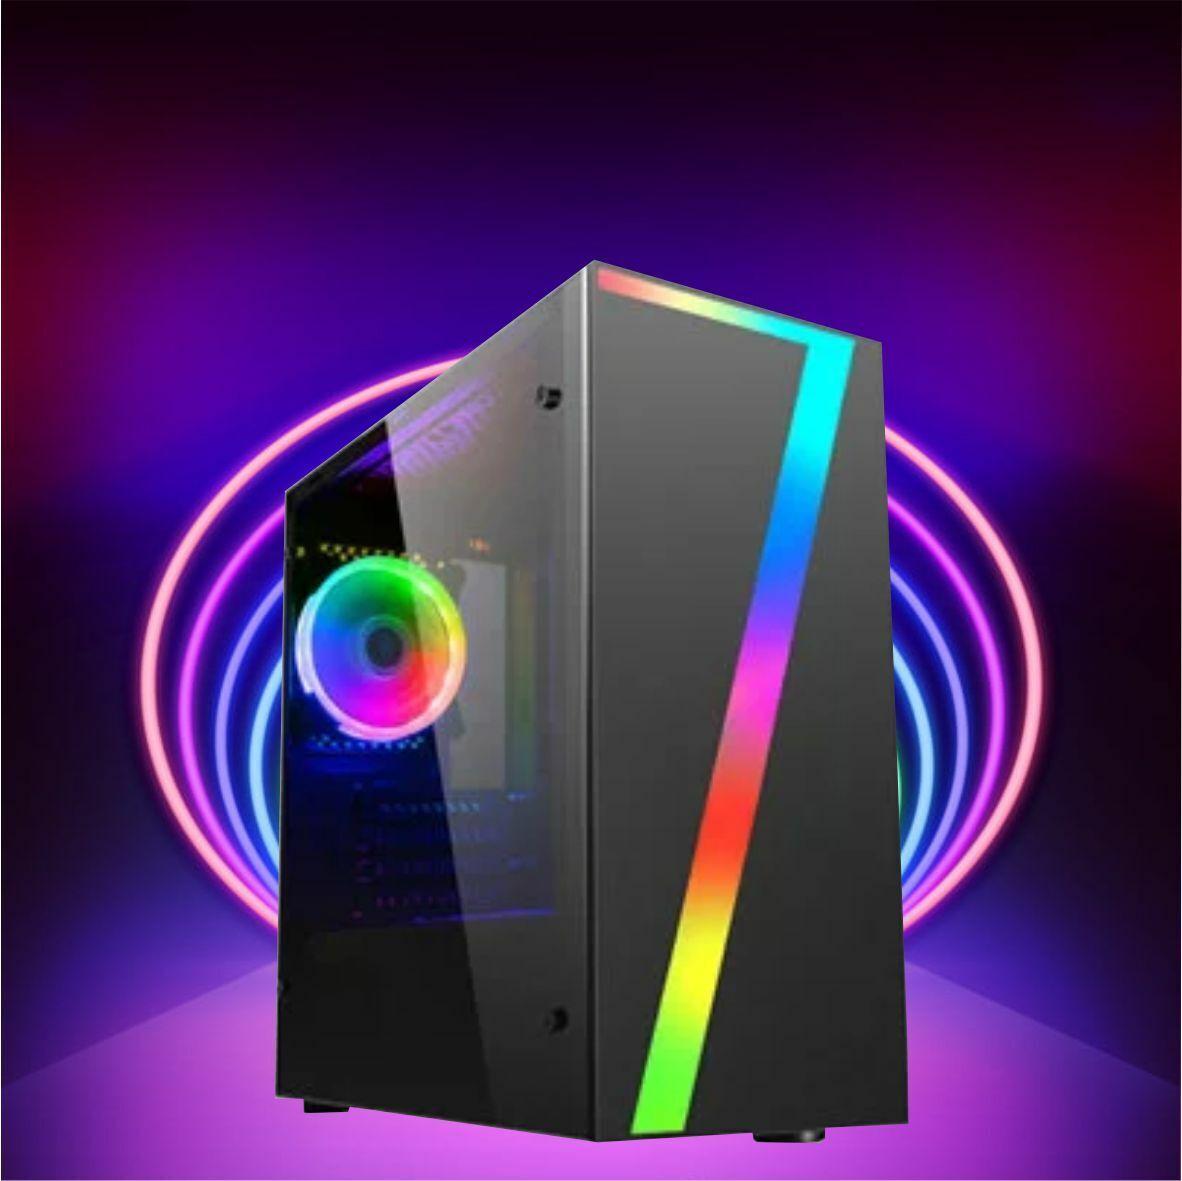 Computer Games - ULTRA FAST Quad Core i5 Gaming Computer PC Tower 8GB 1TB 2GB GT710 Windows 10